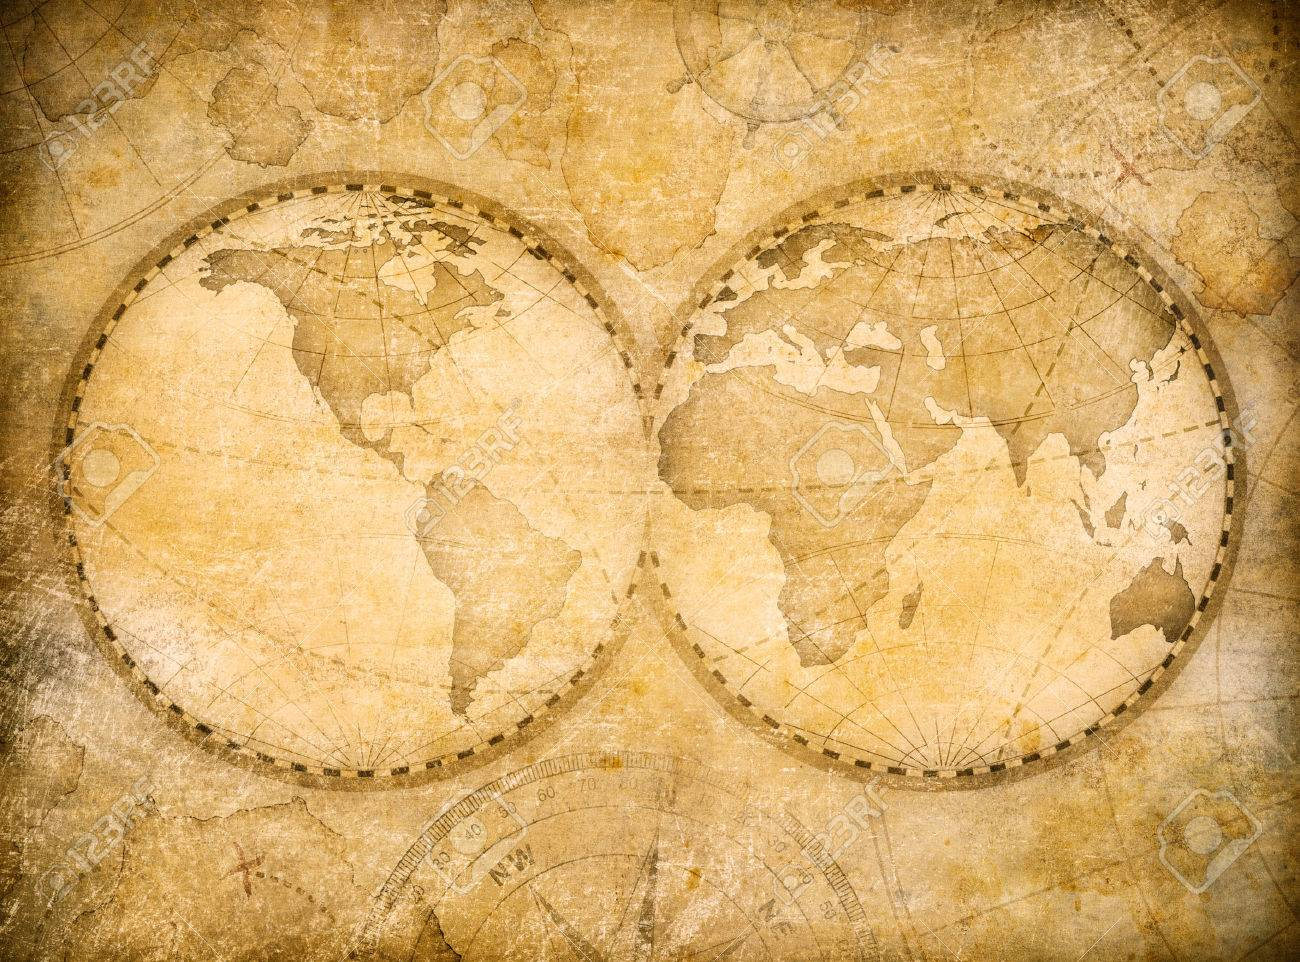 old world map vintage stylization based on image furnished by NASA - 57346328